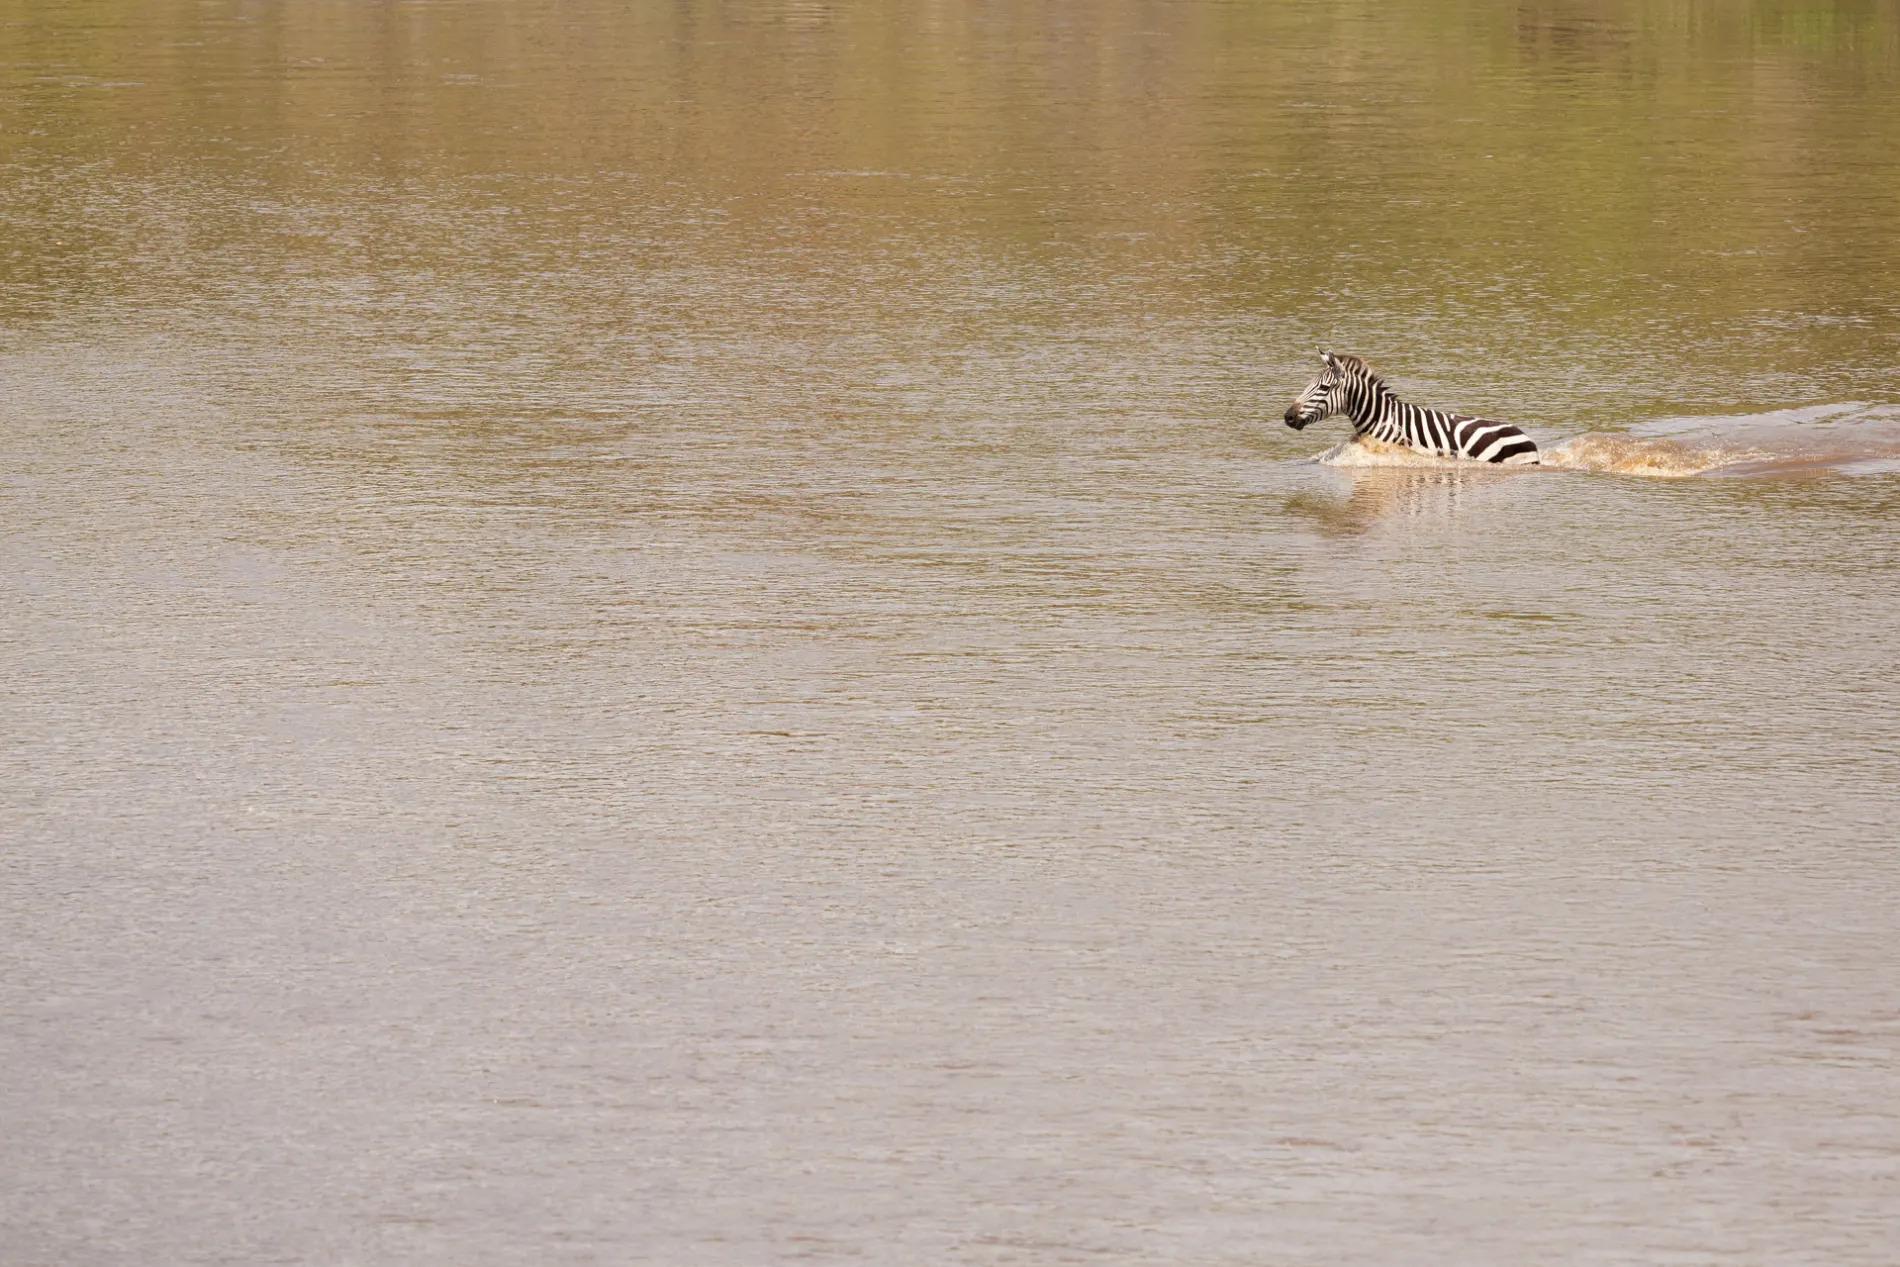 Zebra swimming